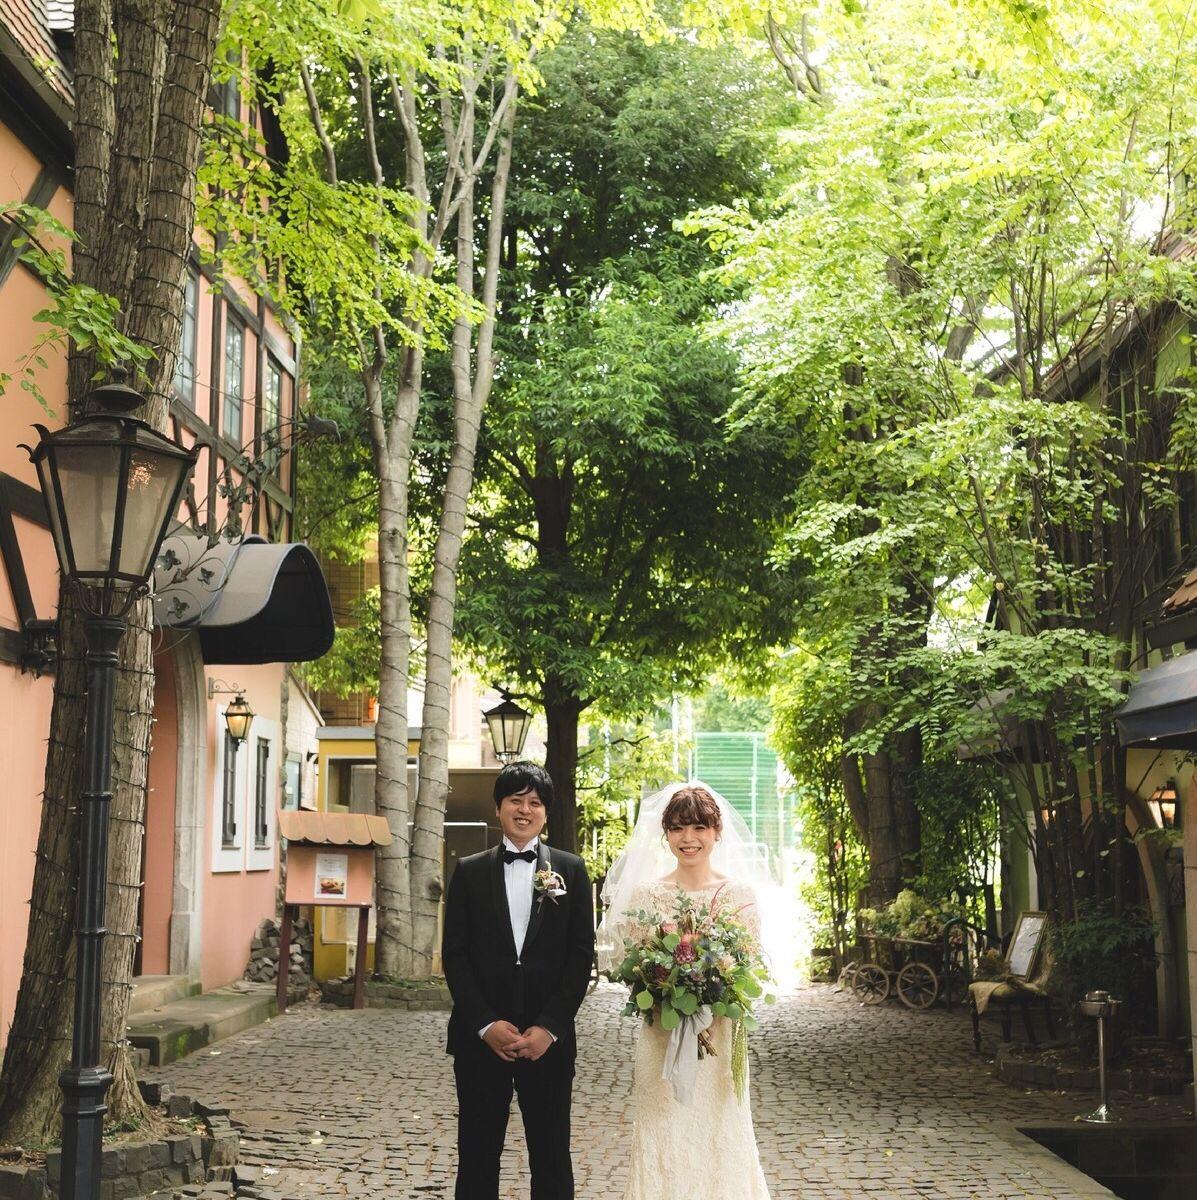 a.wedding0609さんのボンボンボン ラ フェメゾン(Bon Bon Bon LA fait maison)写真1枚目